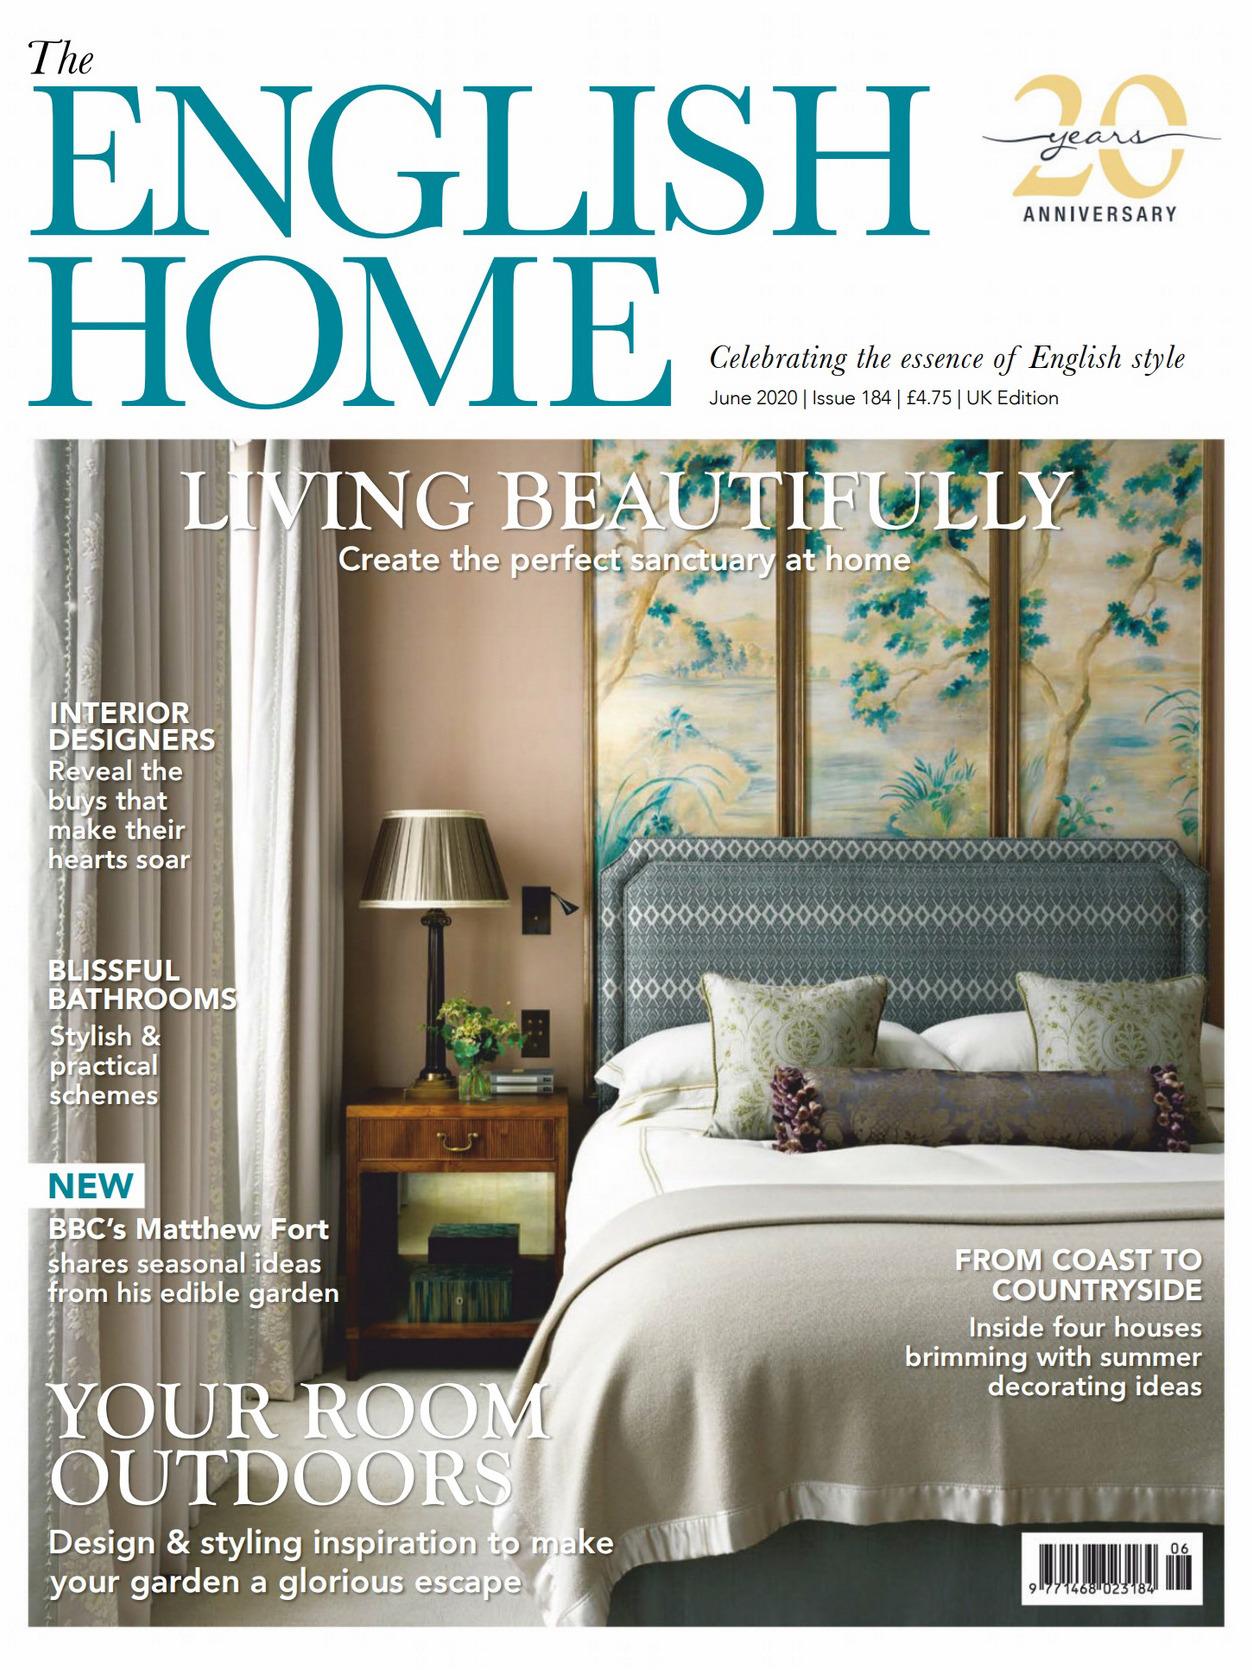 《The English Home》英国版时尚家居杂志2020年06月号